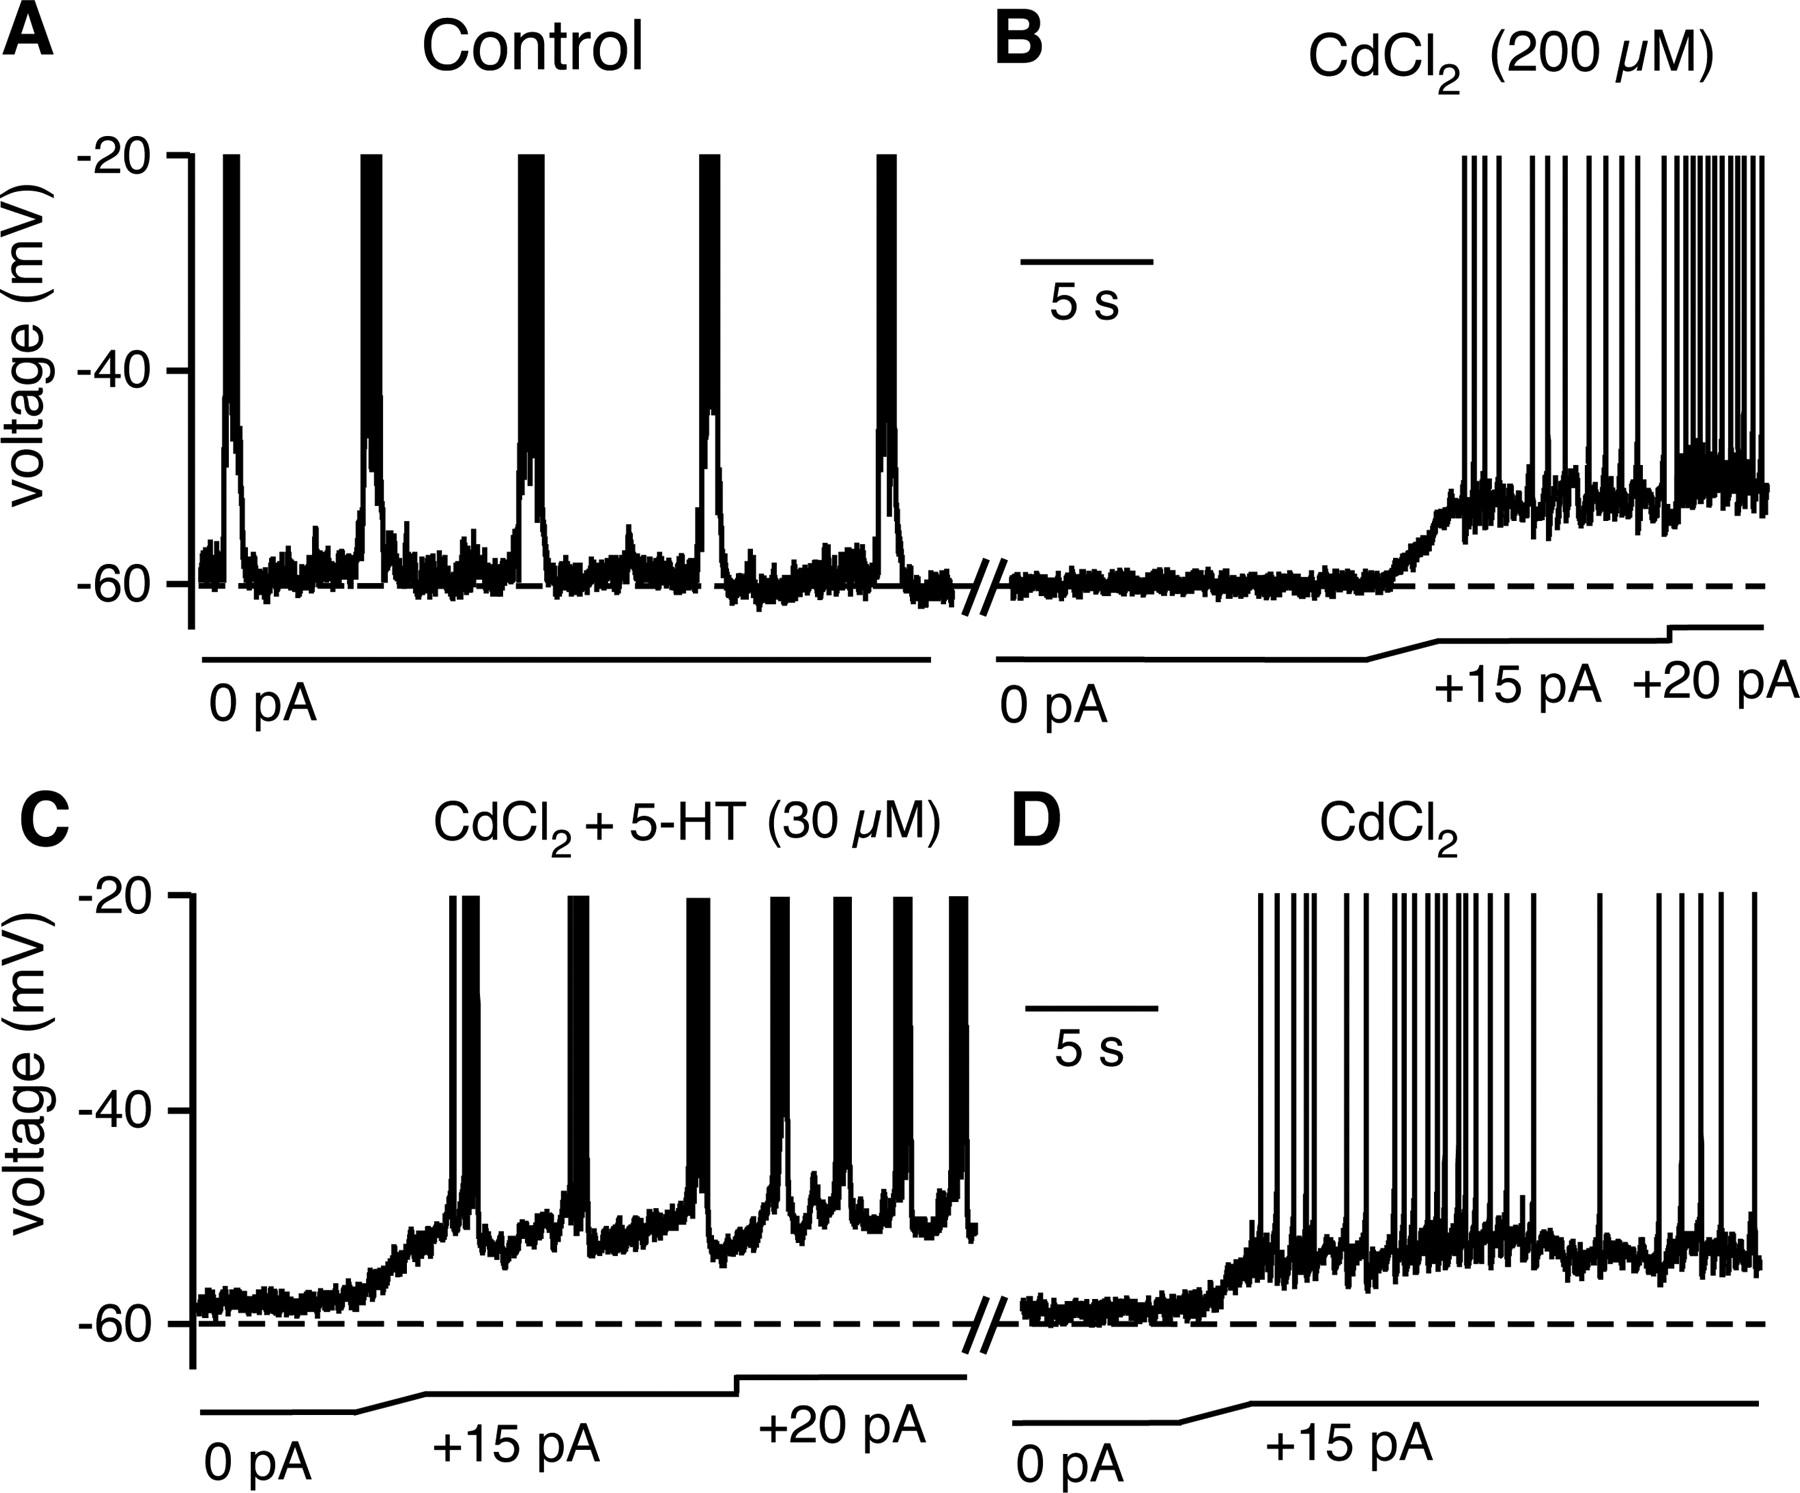 raph u00e9 neurons stimulate respiratory circuit activity by multiple mechanisms via endogenously